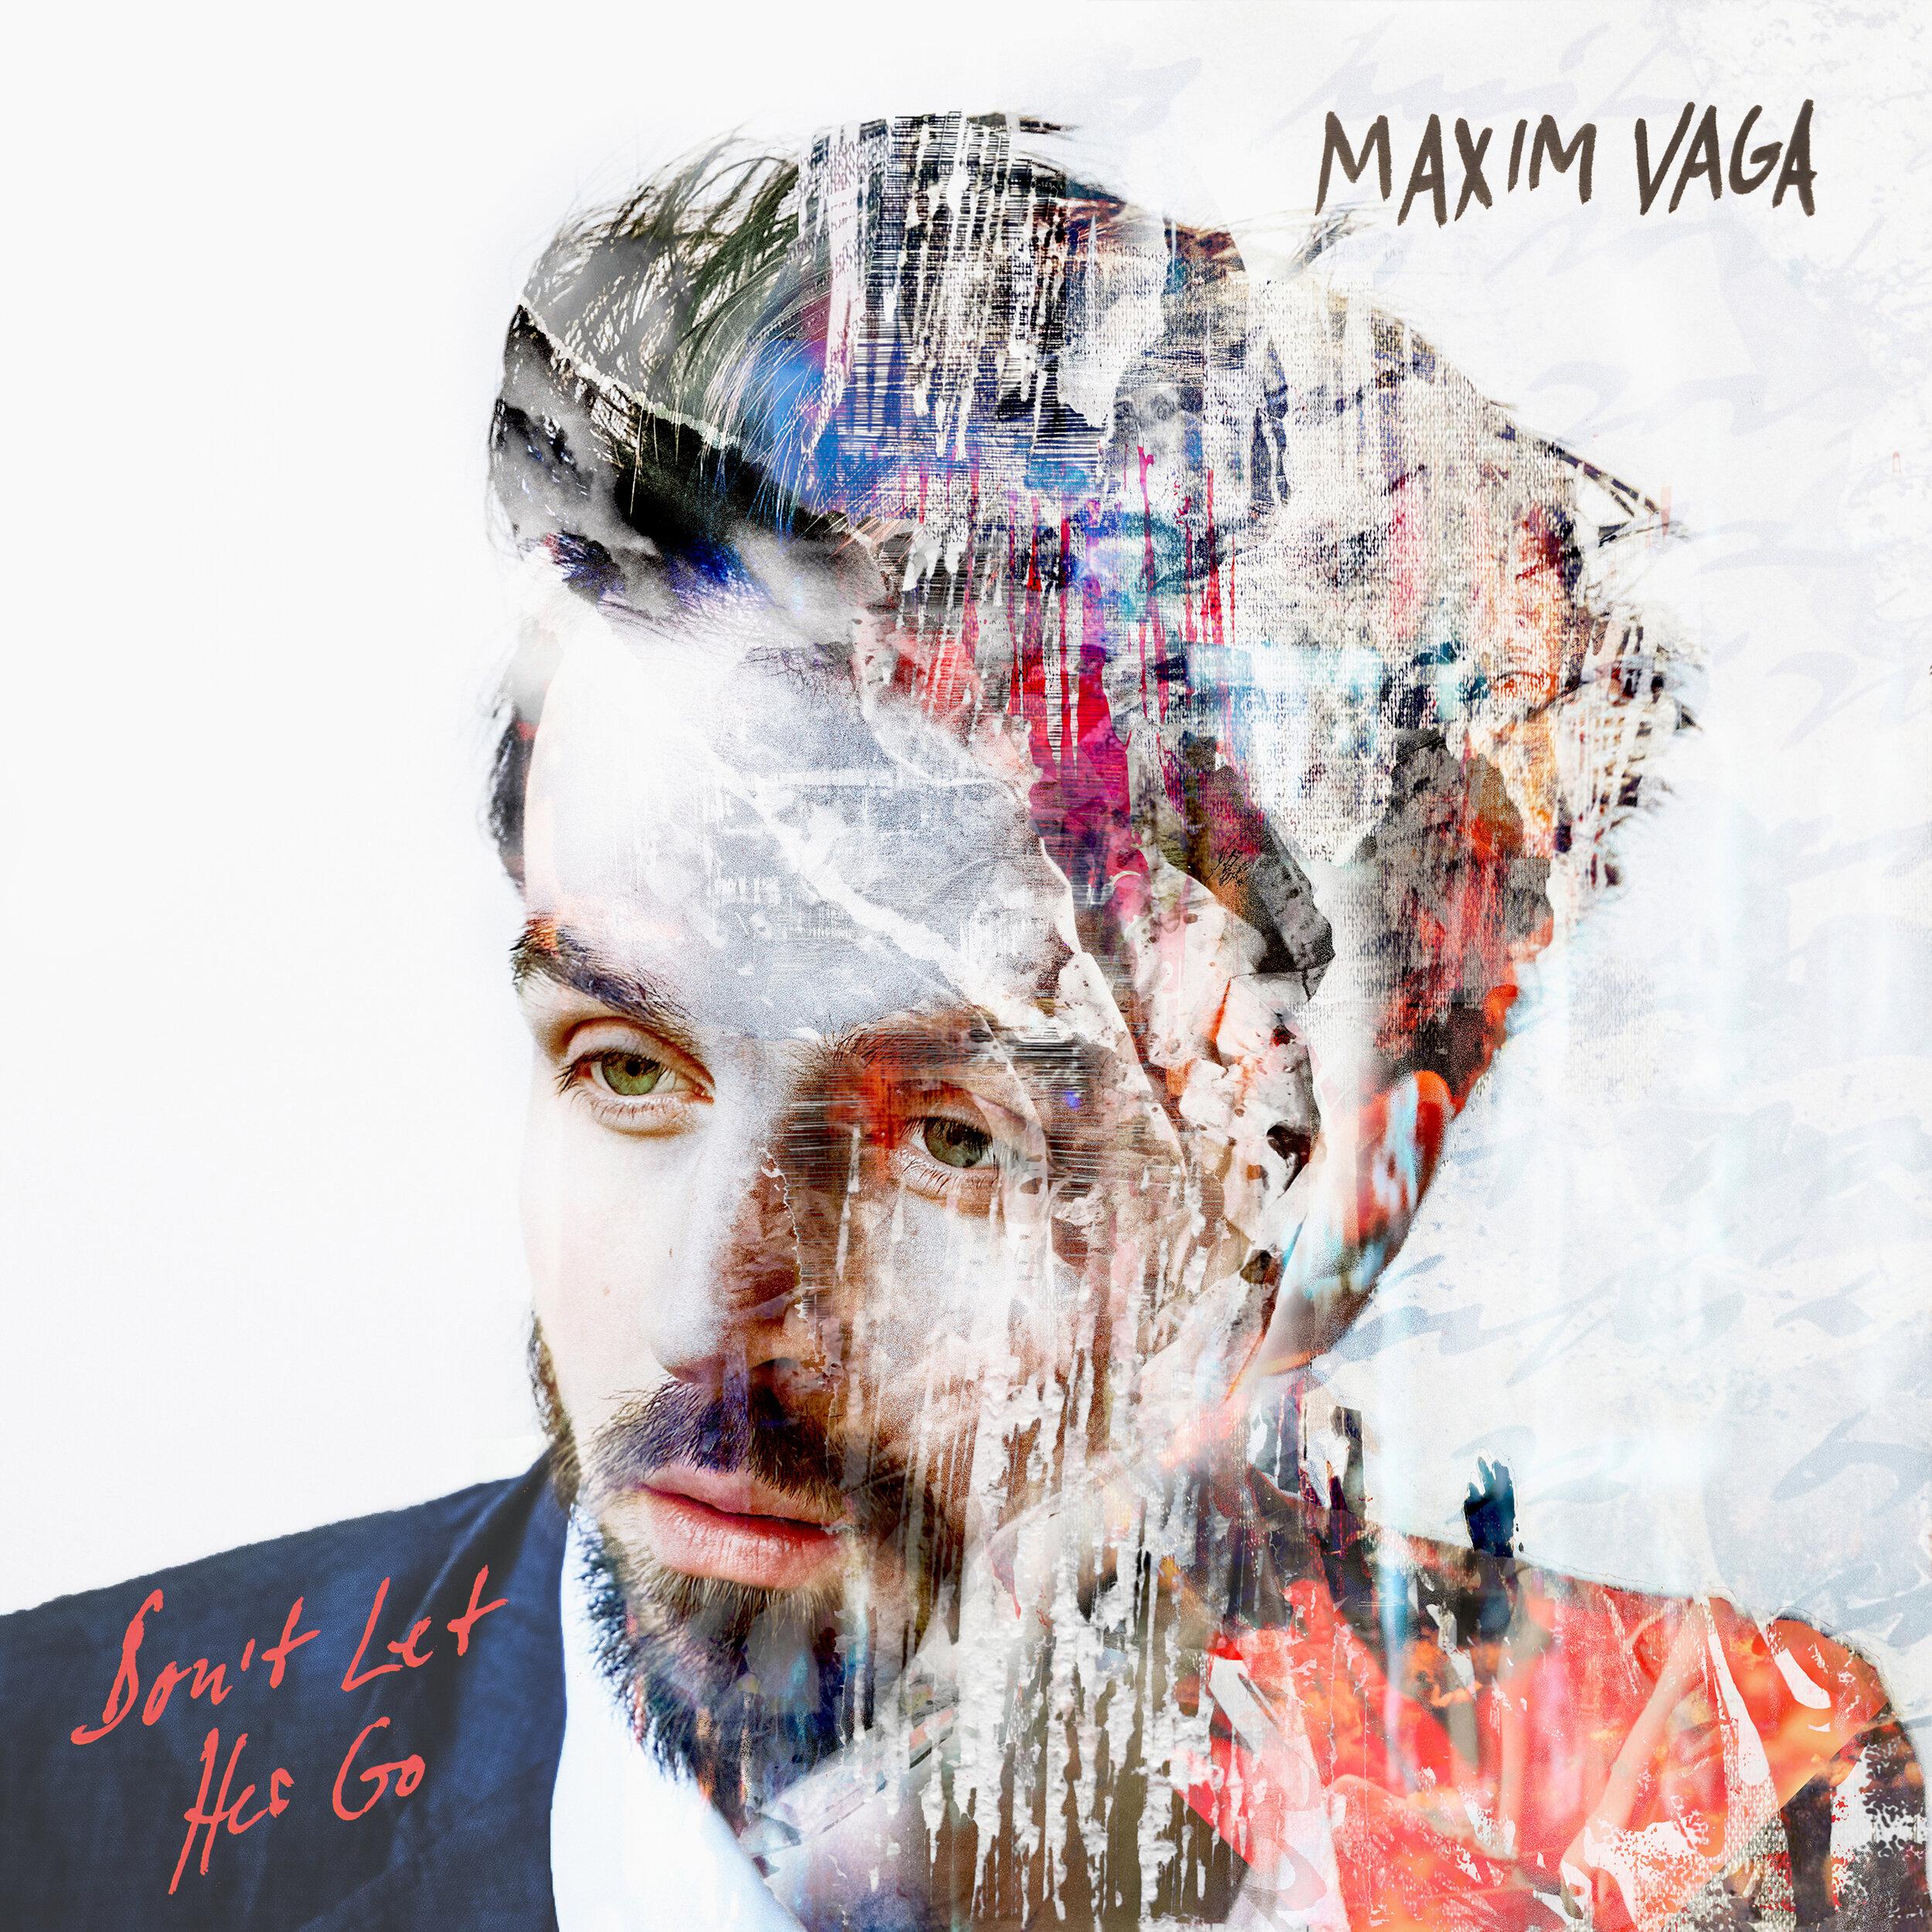 Maxim Vaga - Don't Let Her Go _ Artwork by Fedra Charda _ 3000x3000px.jpeg